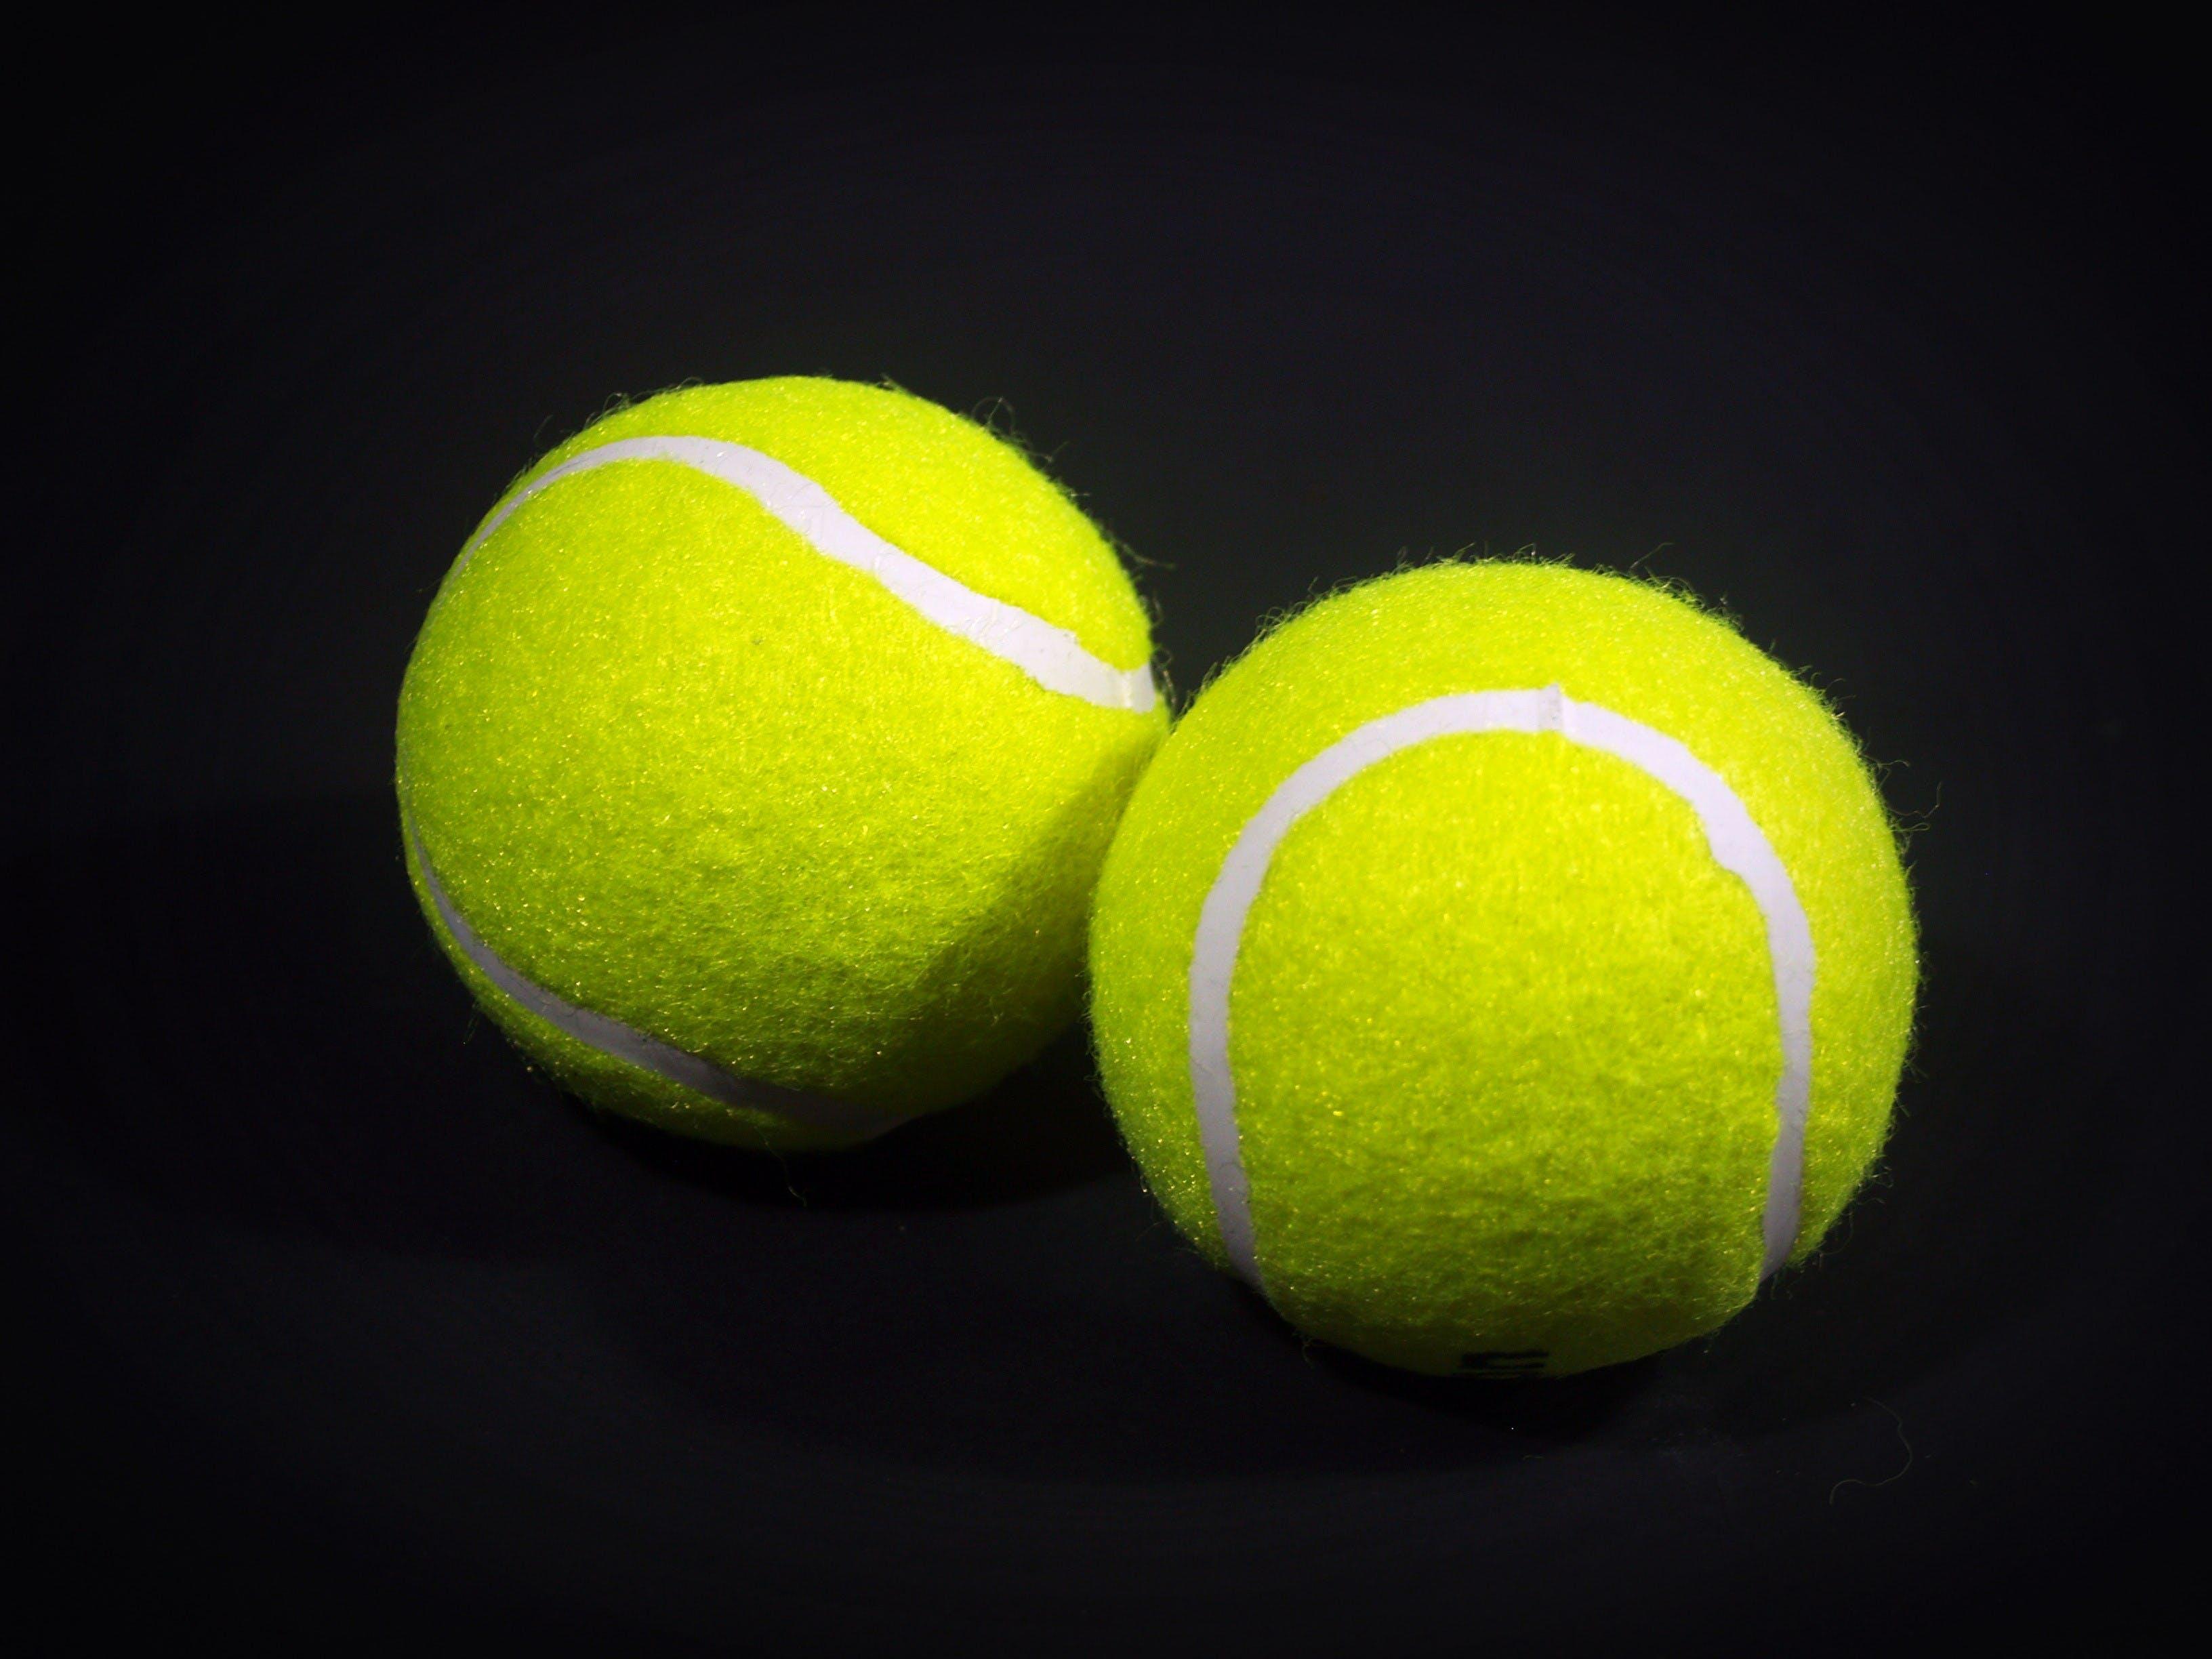 background, balls, close -up